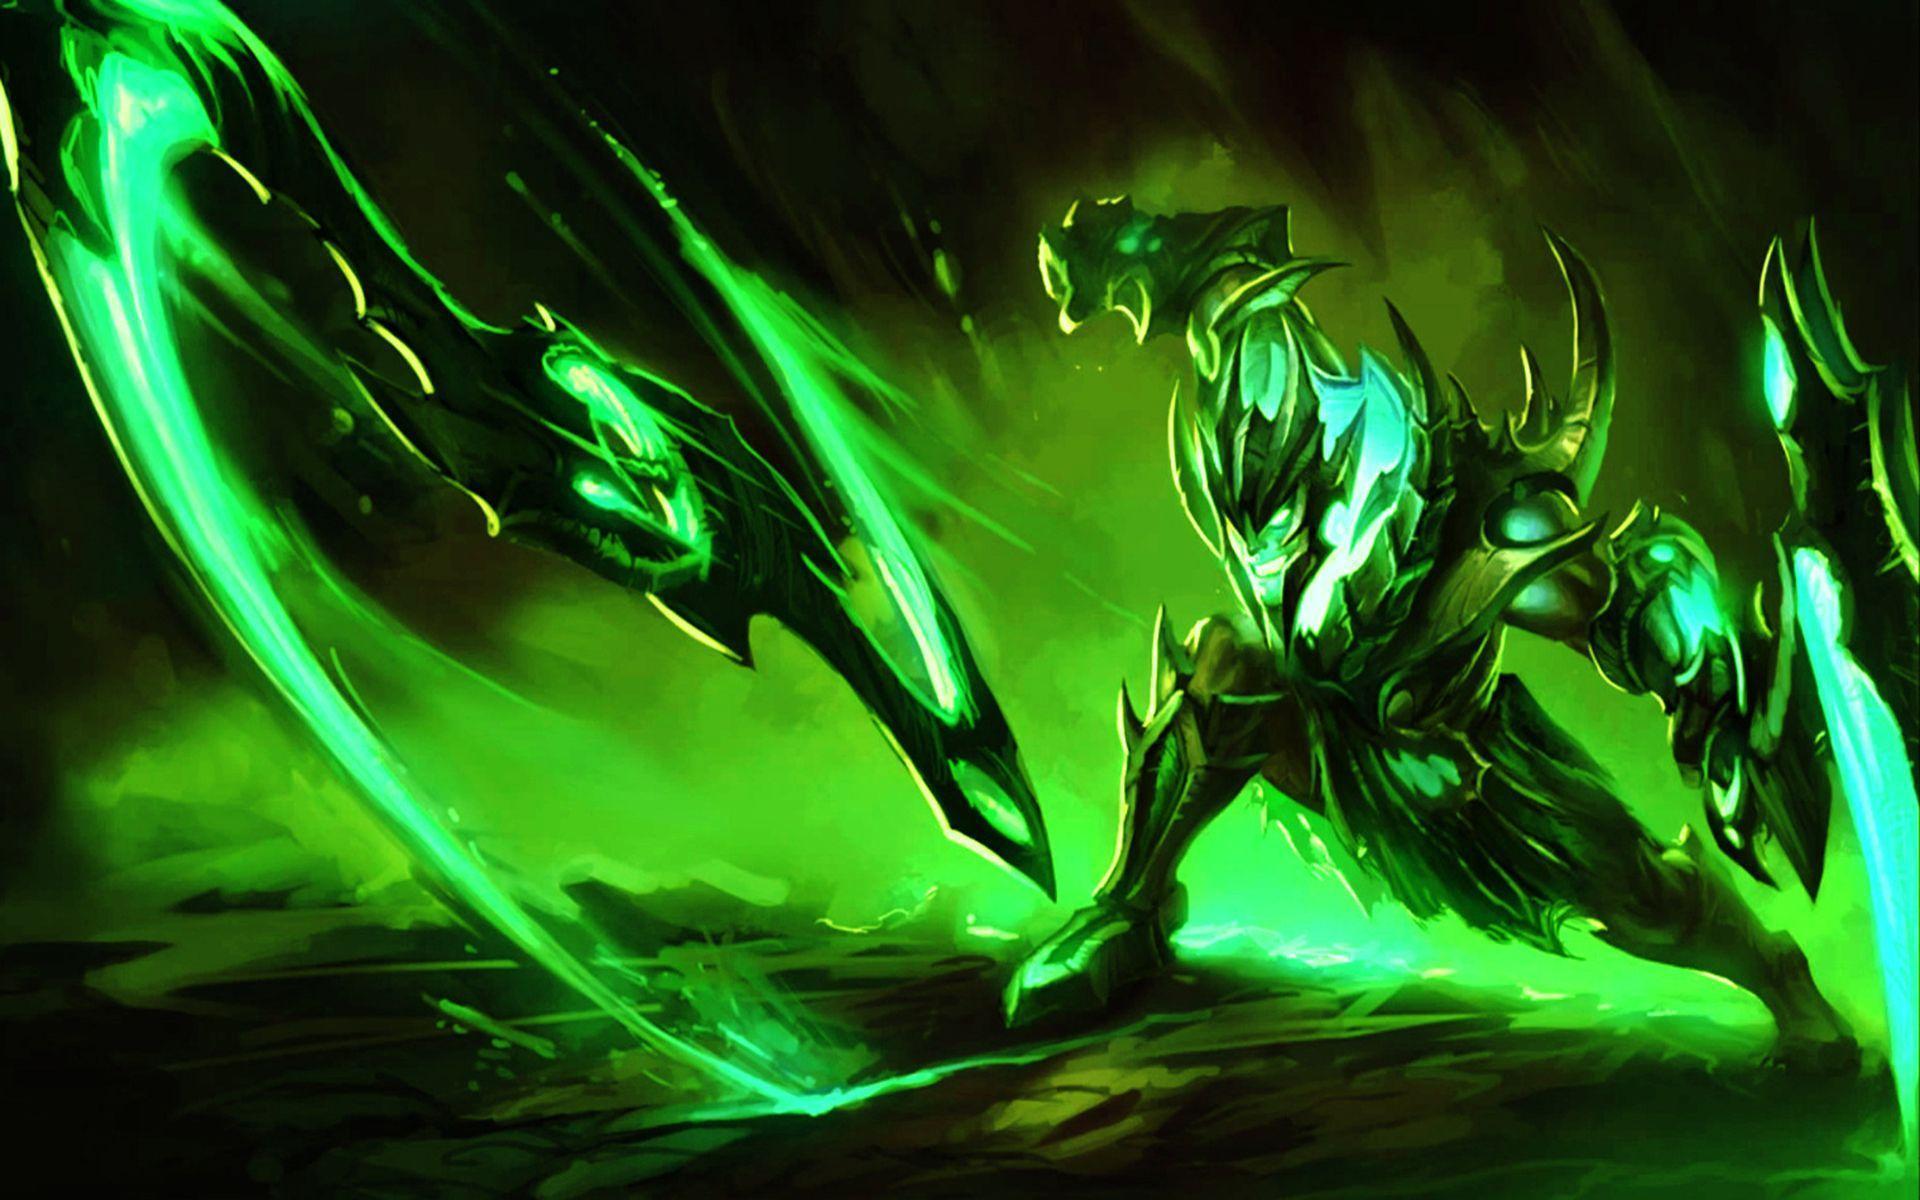 League Of Legends Draven Wallpapers HD : Game Wallpaper - Arunnath.com